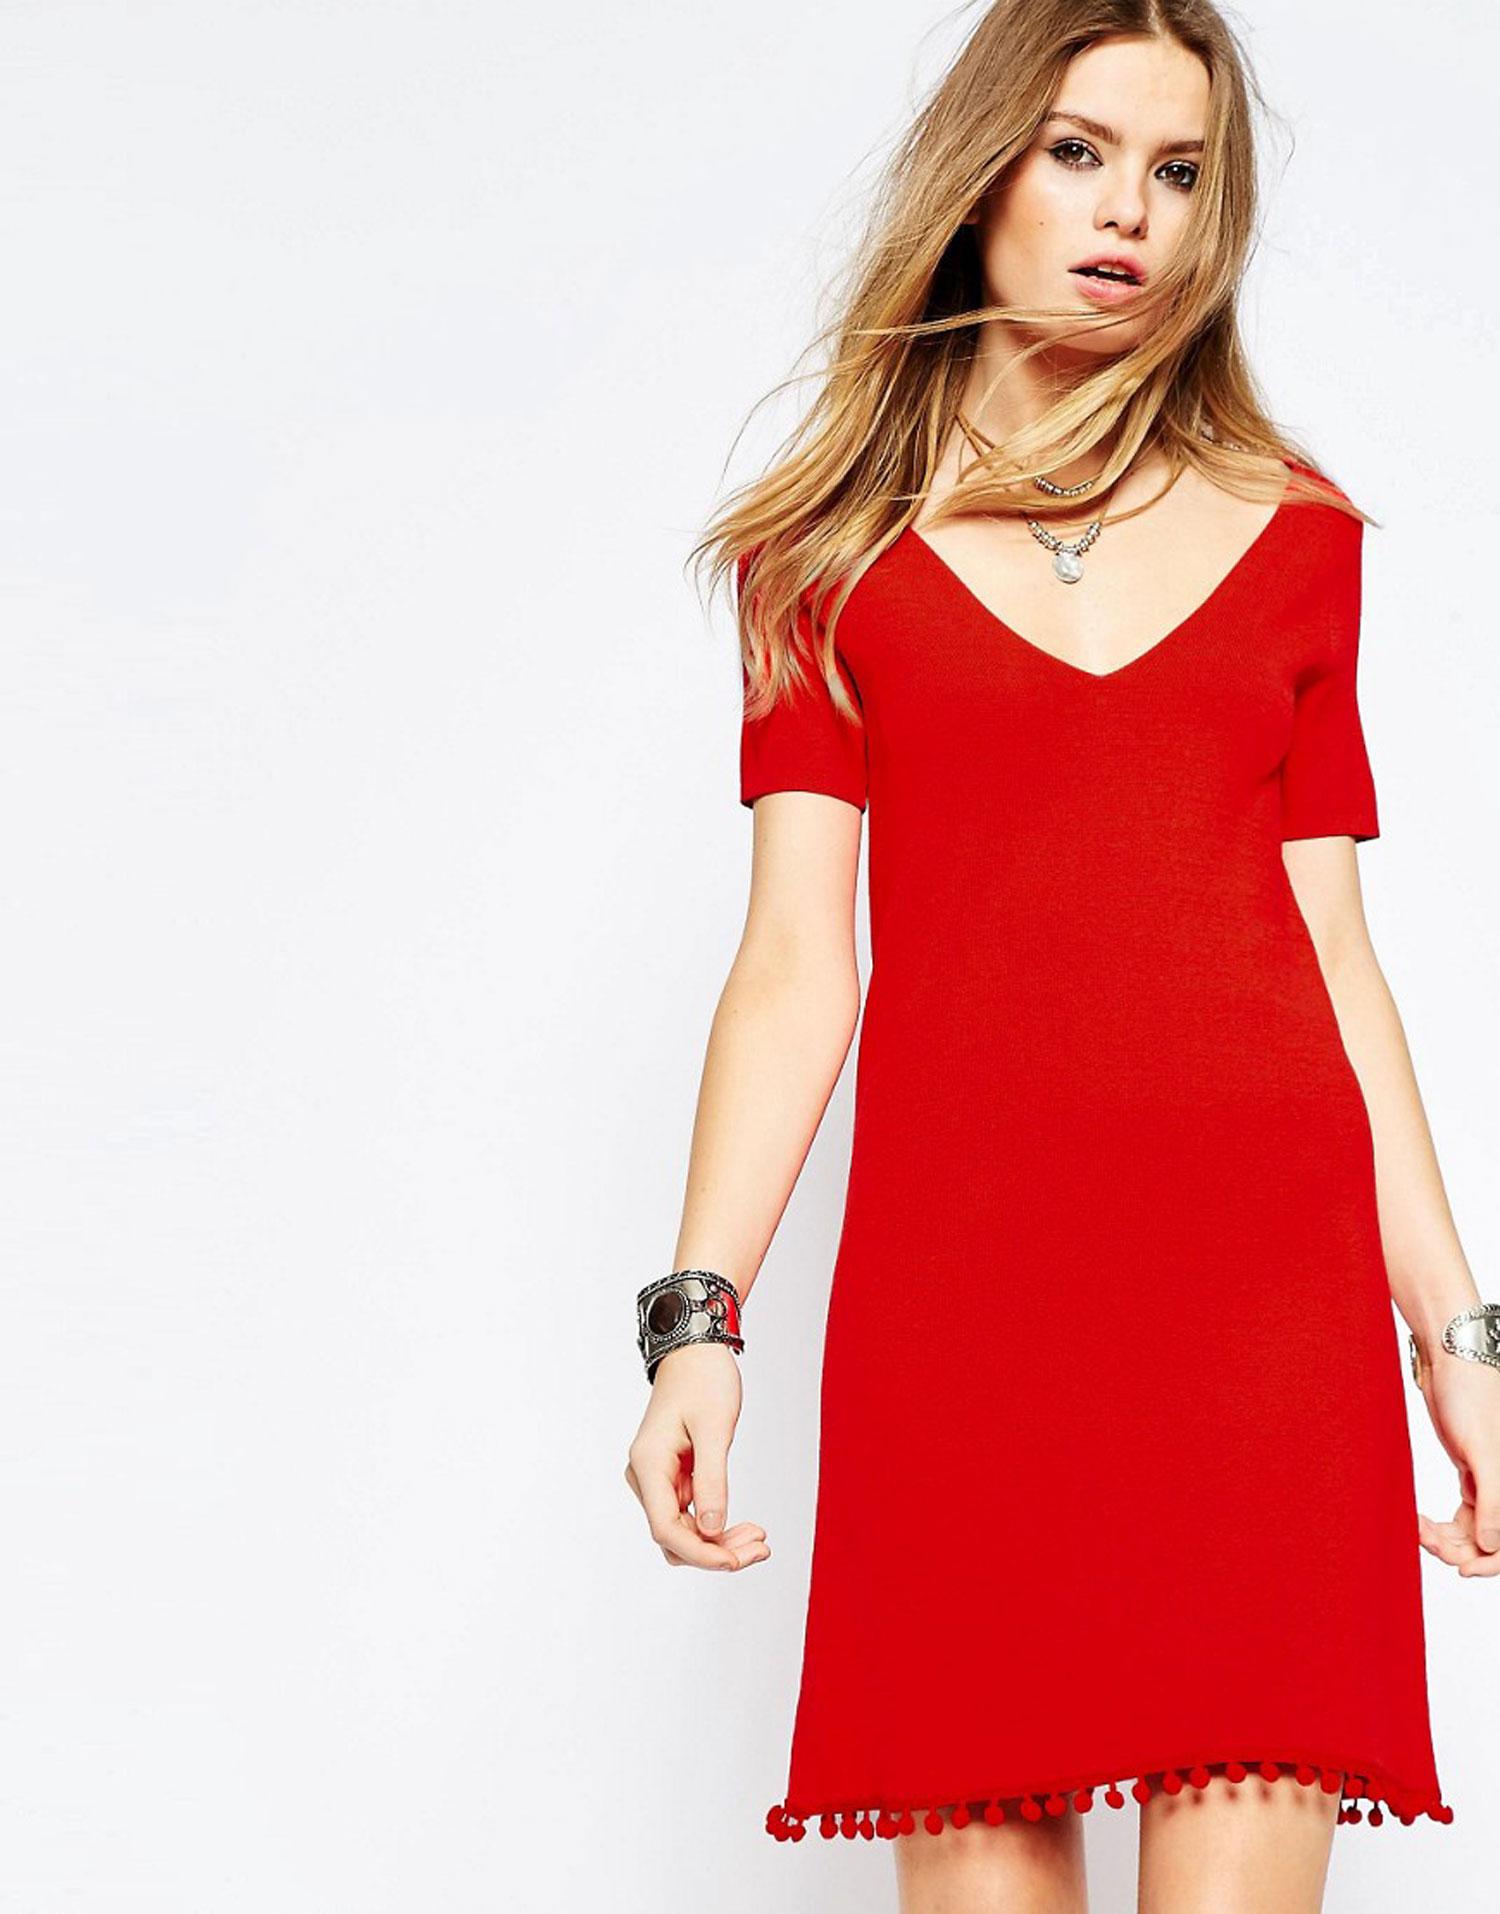 trend lady in red in dieser signalfarbe wollen wir. Black Bedroom Furniture Sets. Home Design Ideas